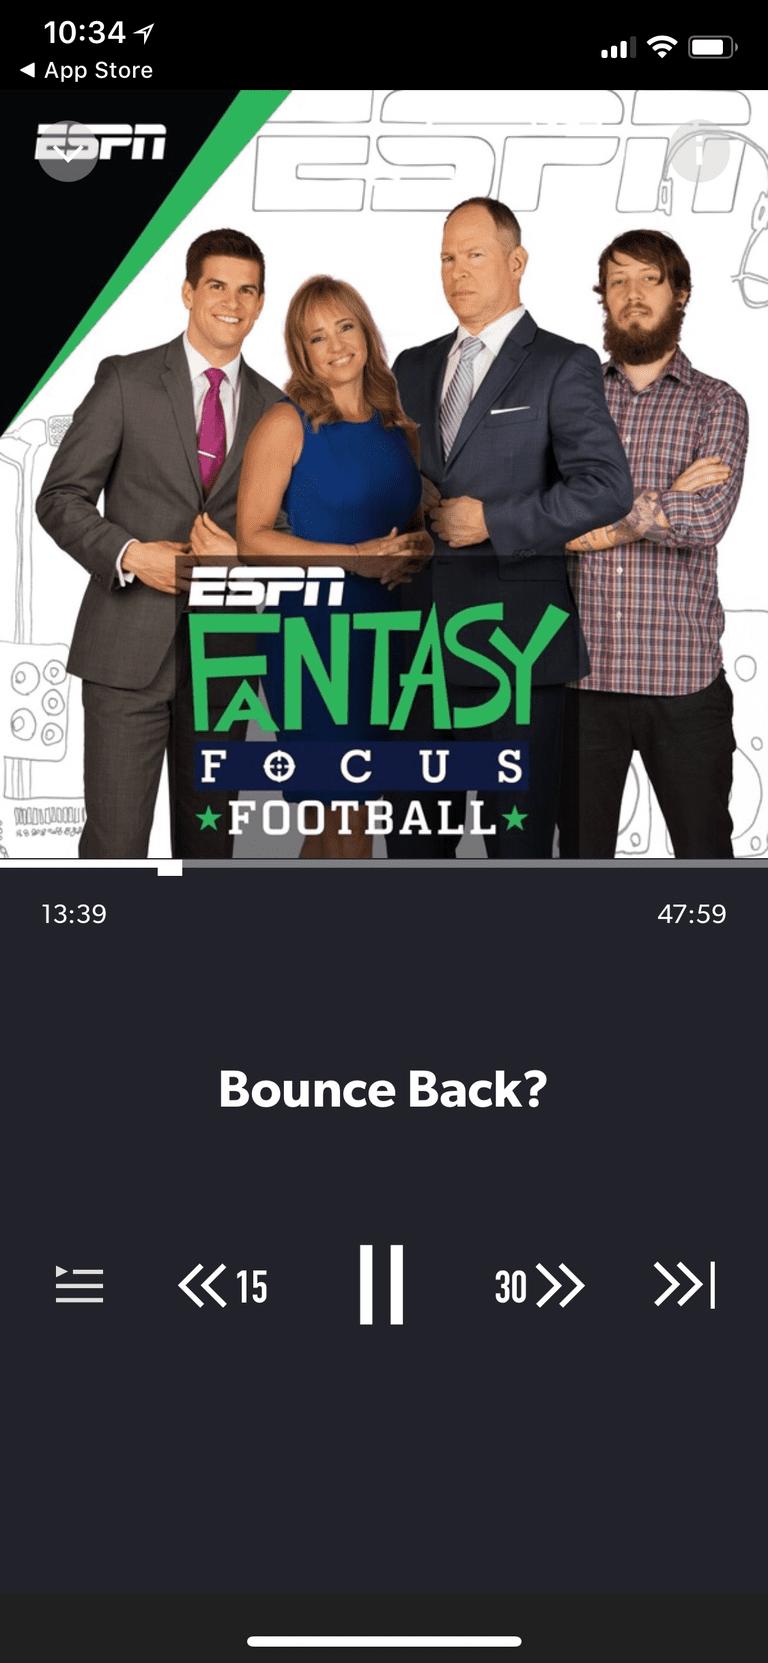 Fantasy Focus Football podcast